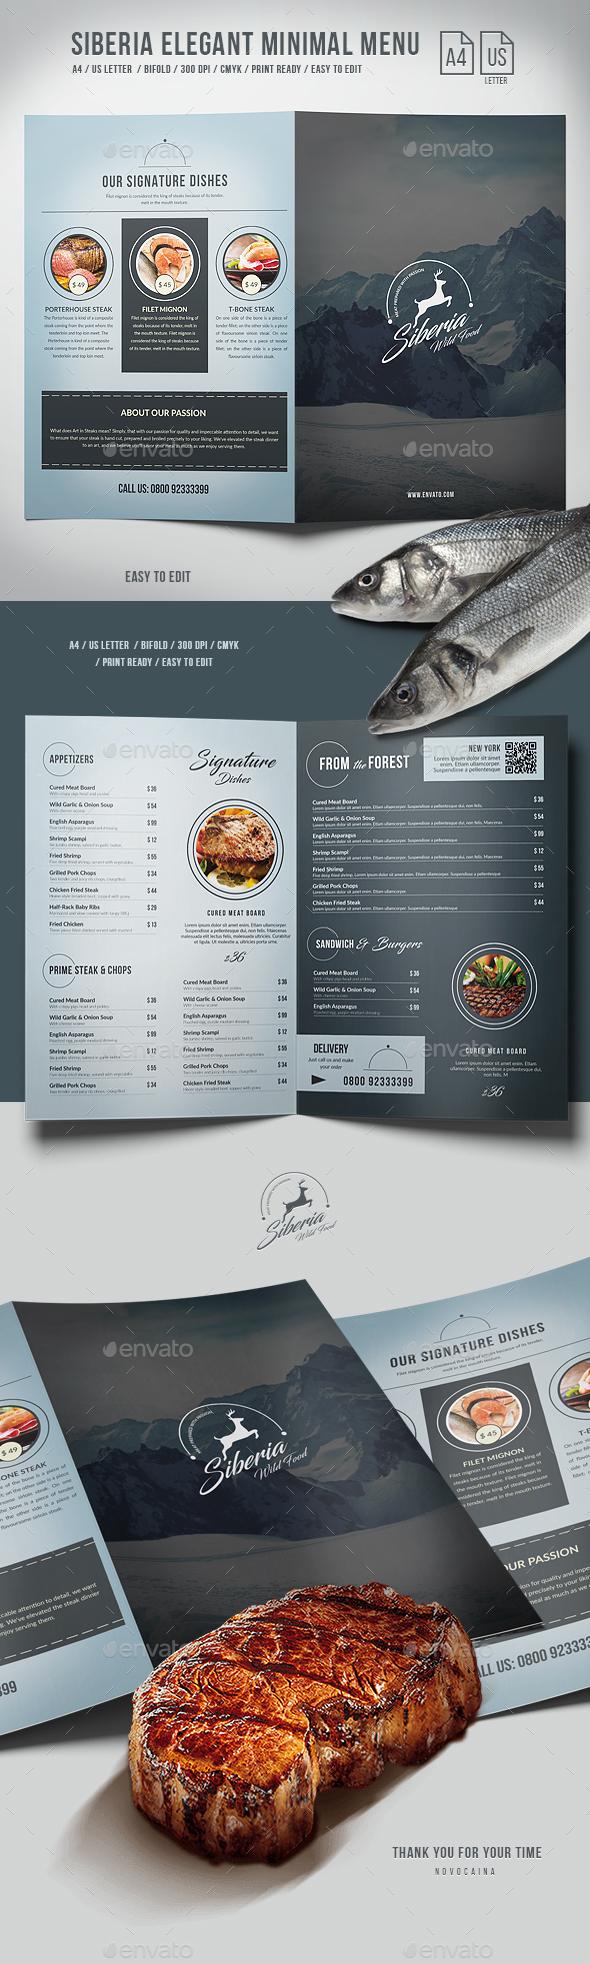 GraphicRiver Siberia Elegant Minimal BiFold Menu A4 and US Letter 20387607